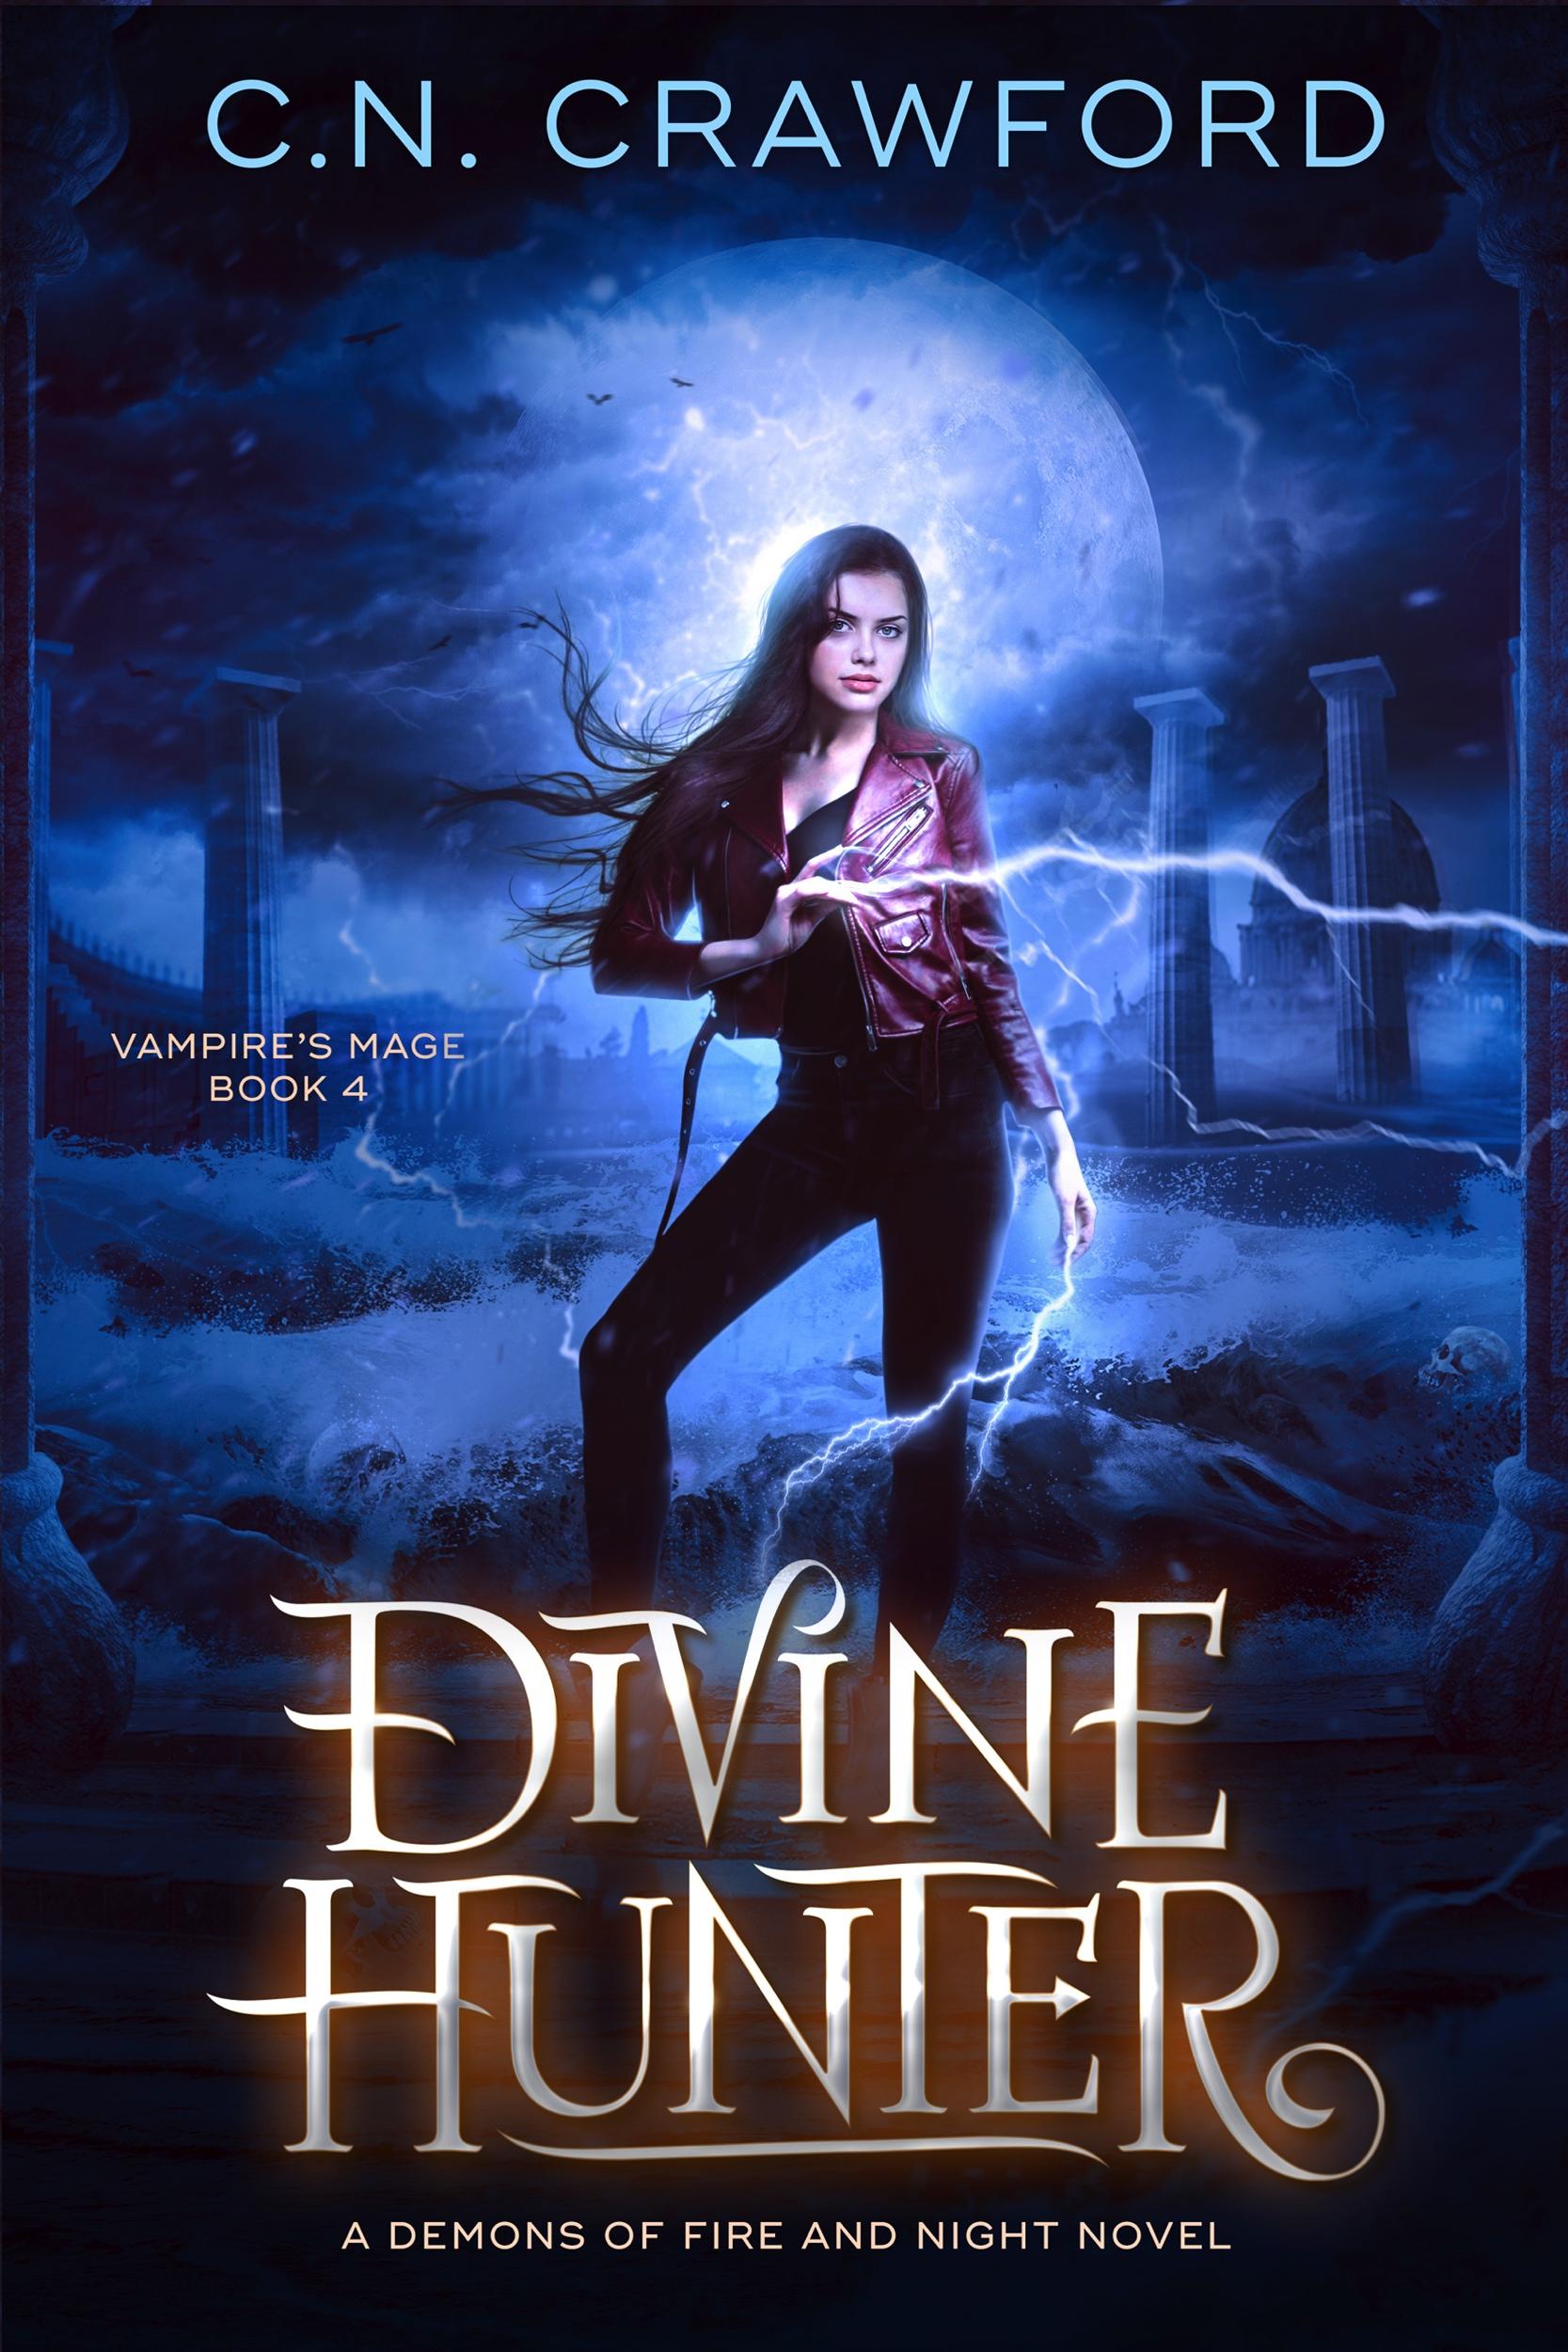 Book 4: Divine Hunter